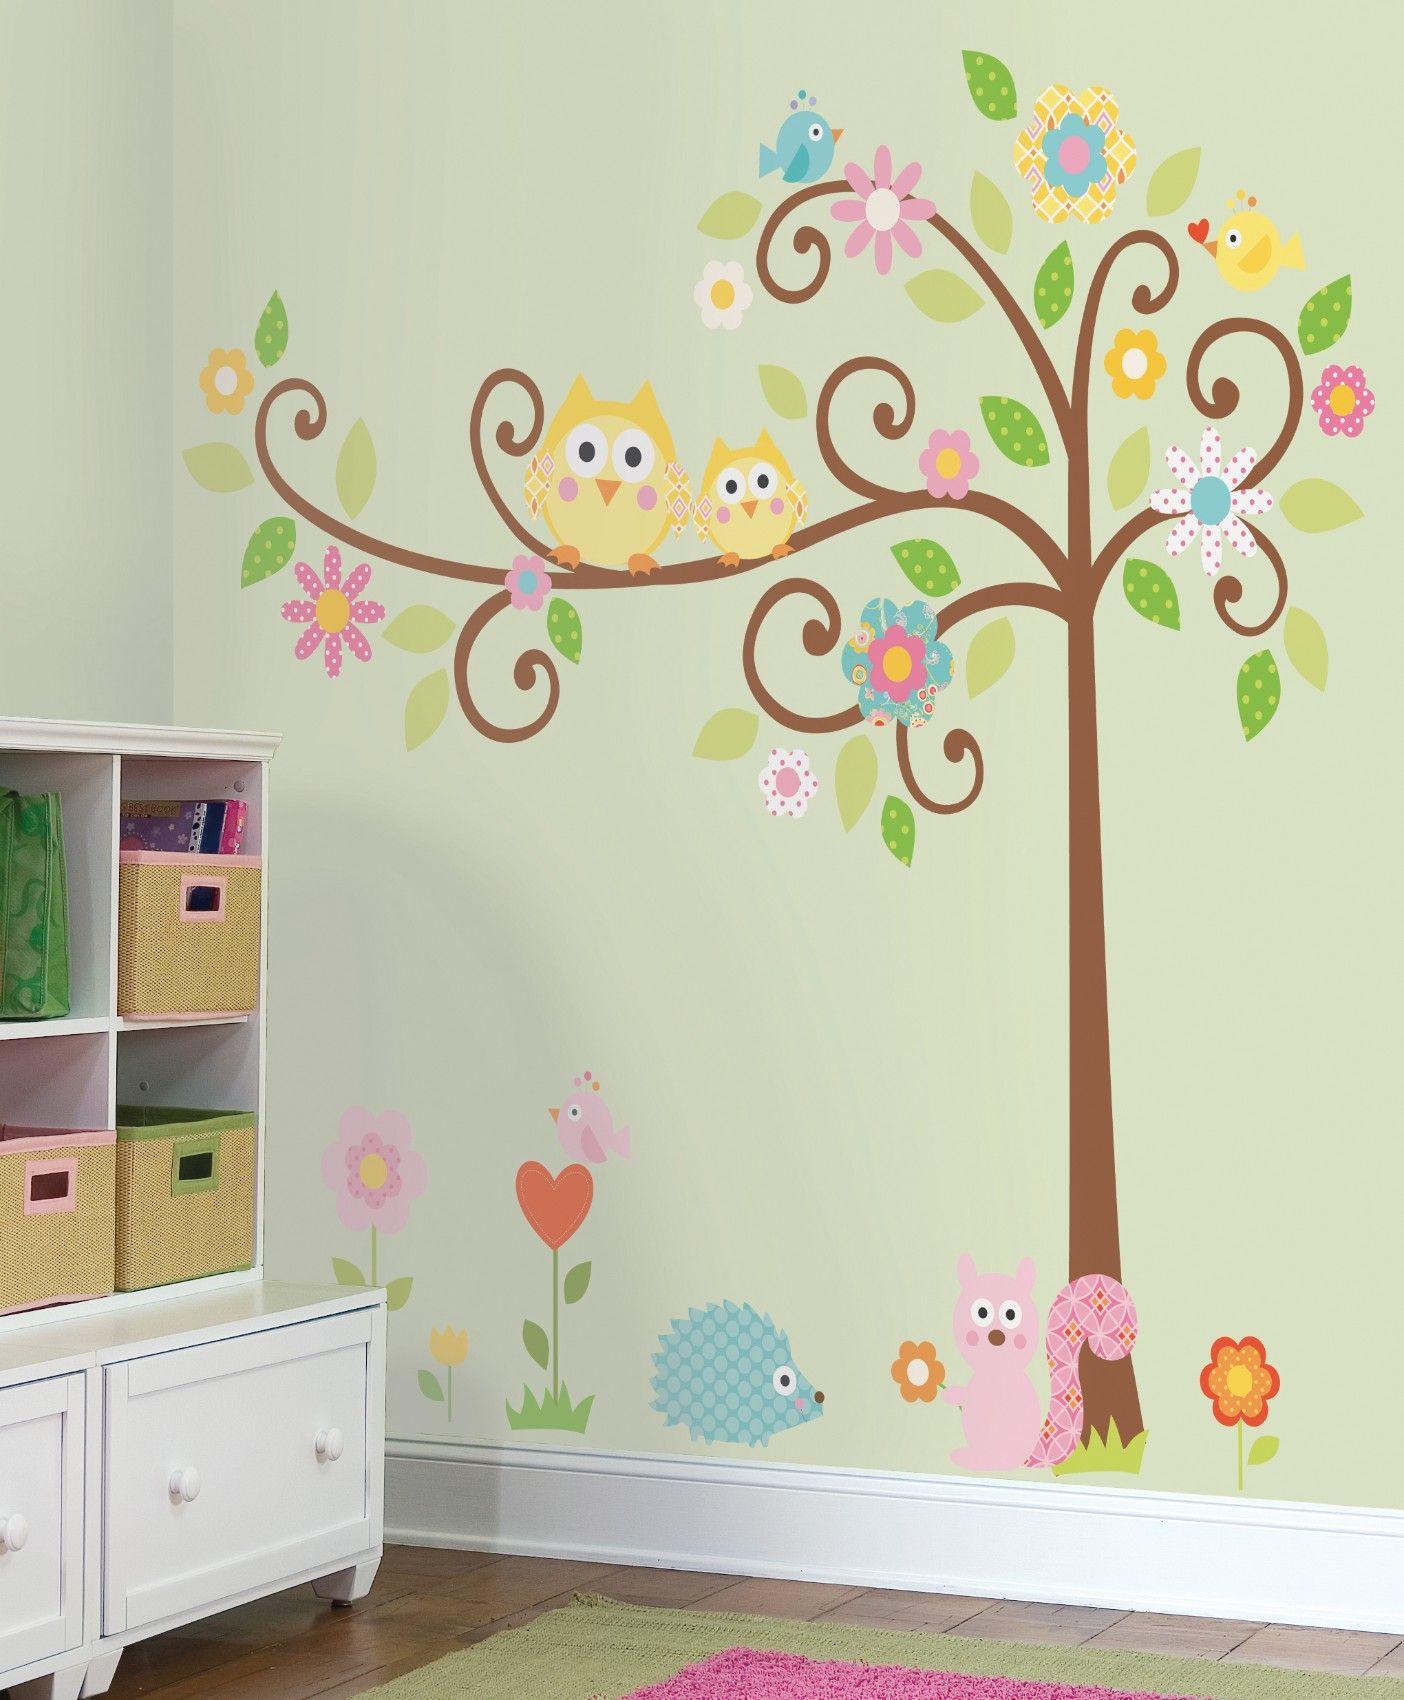 Super Cute Wall Stencil Kids Rooms Pinterest Wall Stenciling